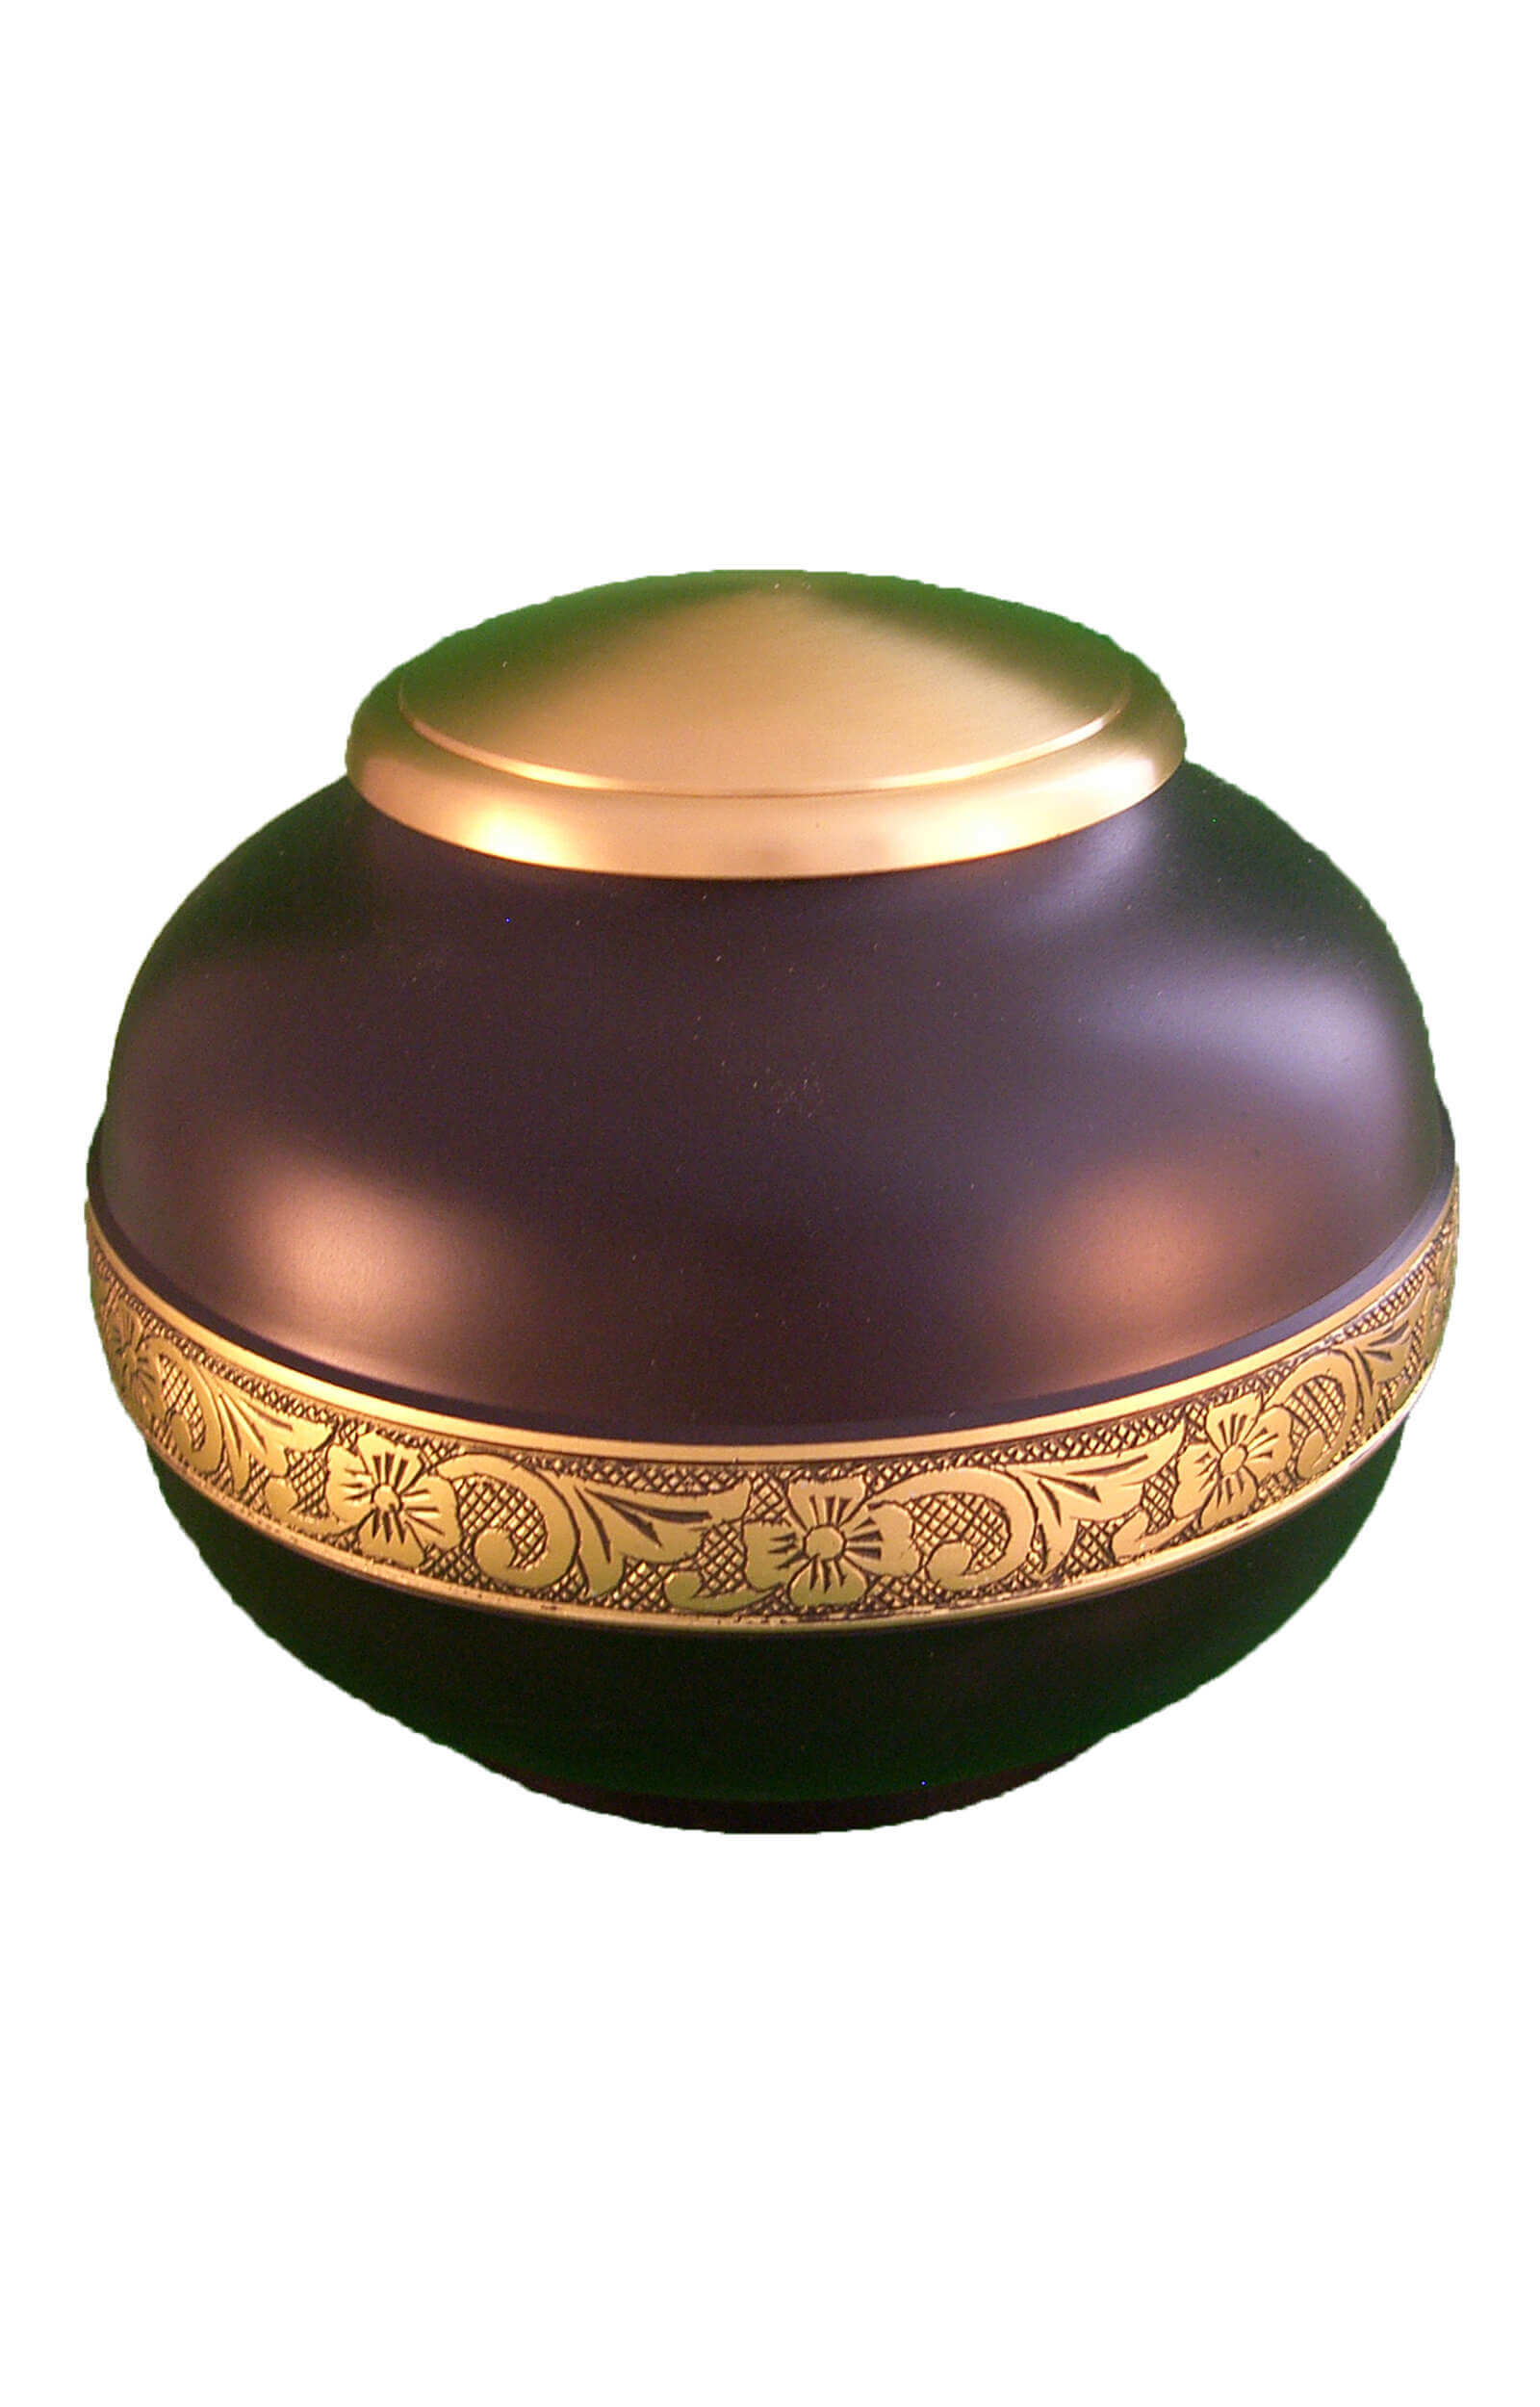 en TIB930 raisin purple and gold pet urn.jpg